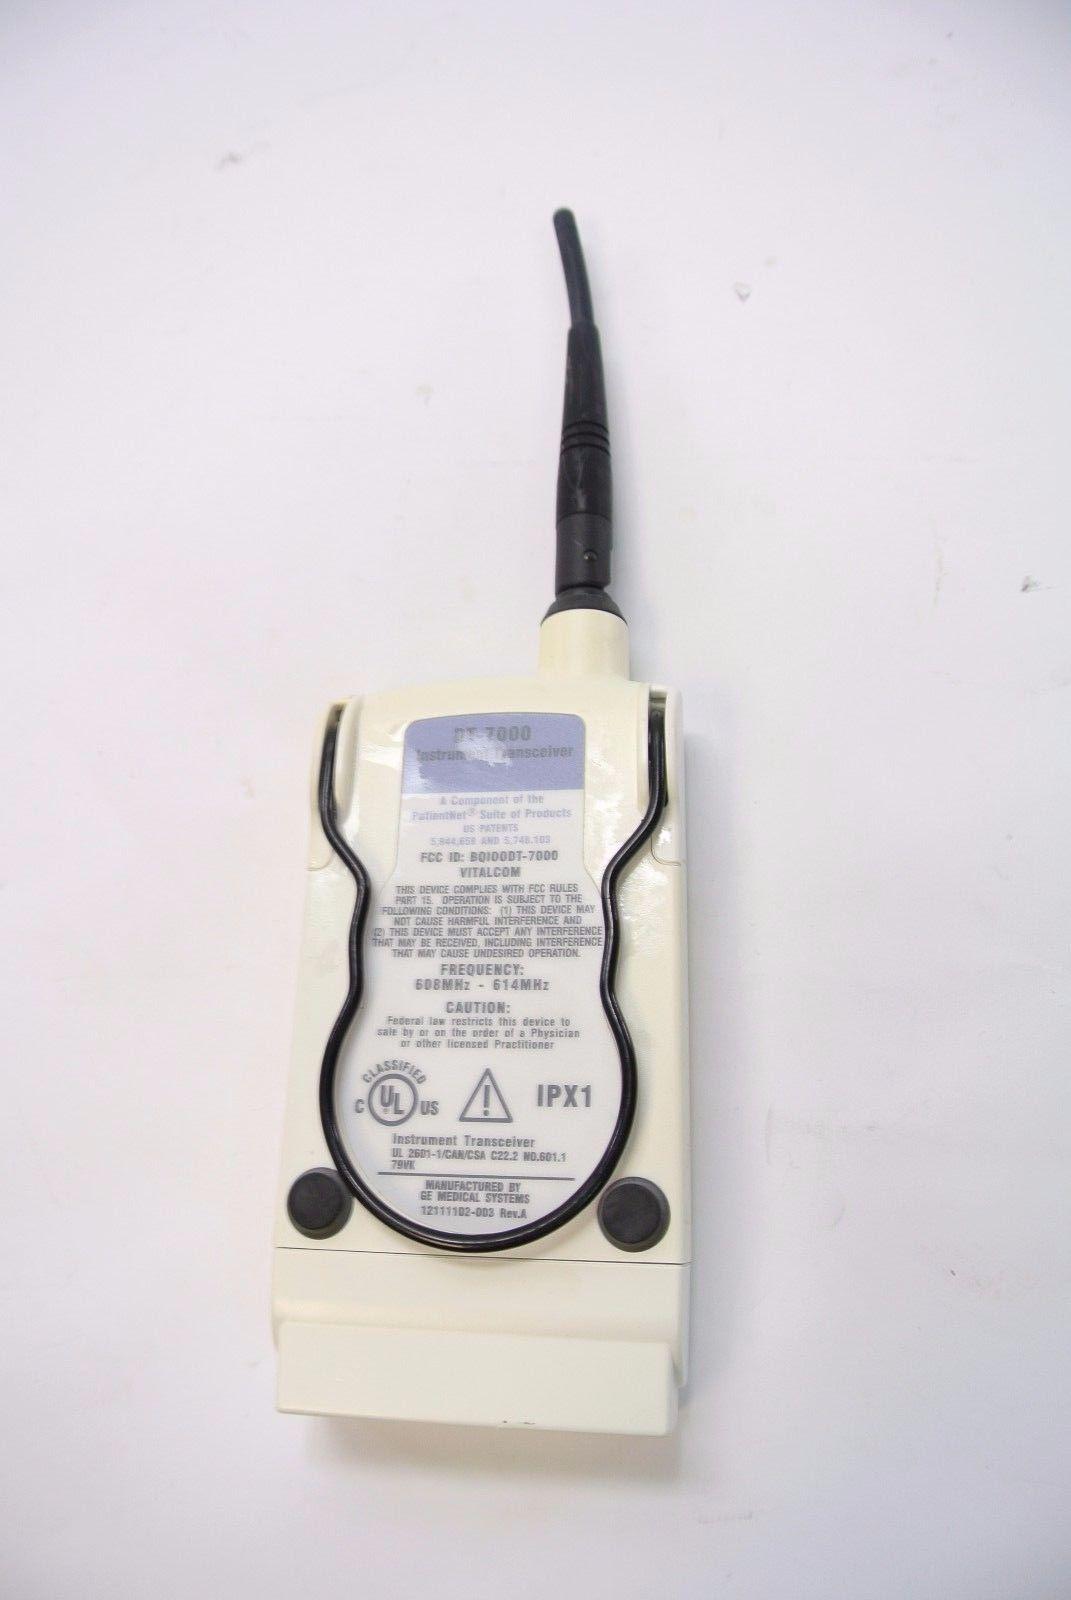 Datascope PatientNet Instrument Transceiver 12110000-001 608Mhz-614Mhz